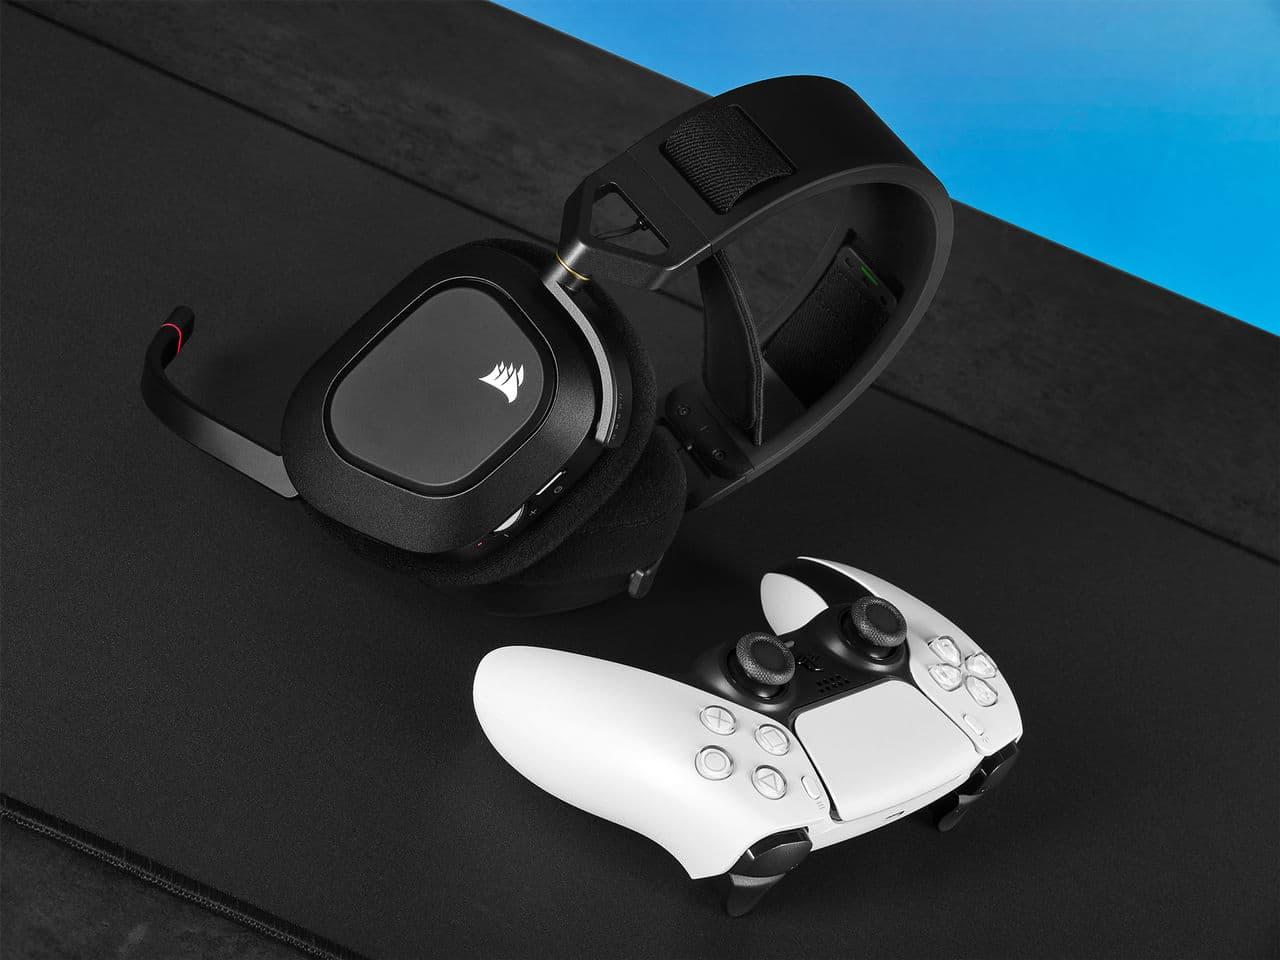 Corsair's latest addition HS80 RGB Wireless